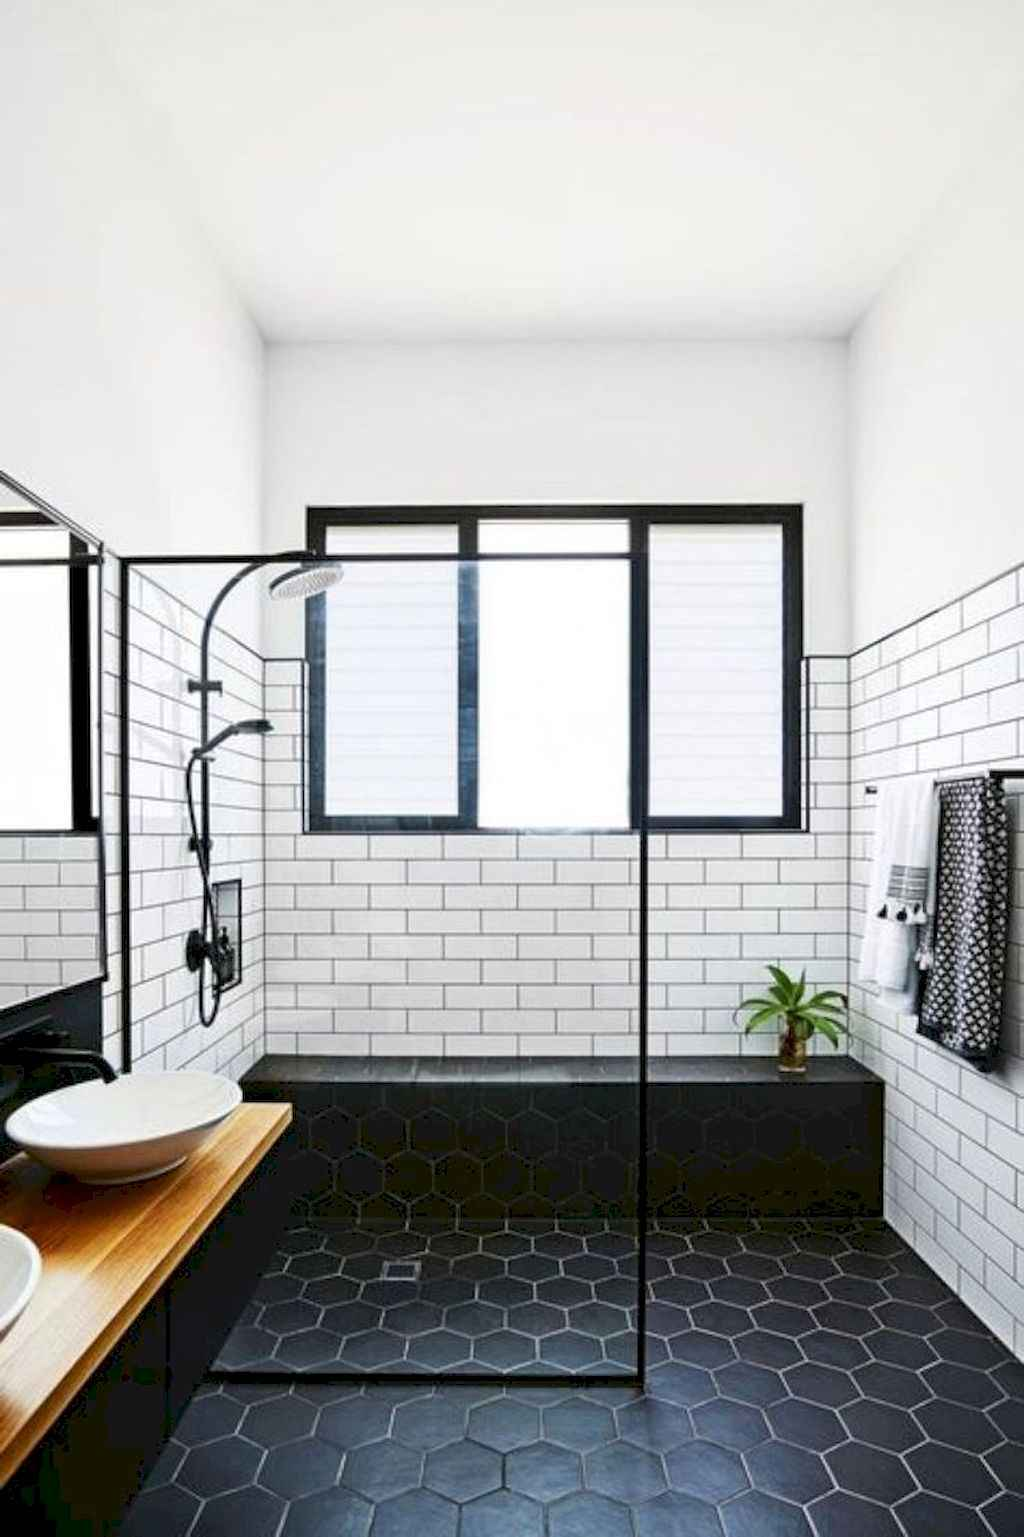 111 Brilliant Small Bathroom Remodel Ideas On A Budget (9)